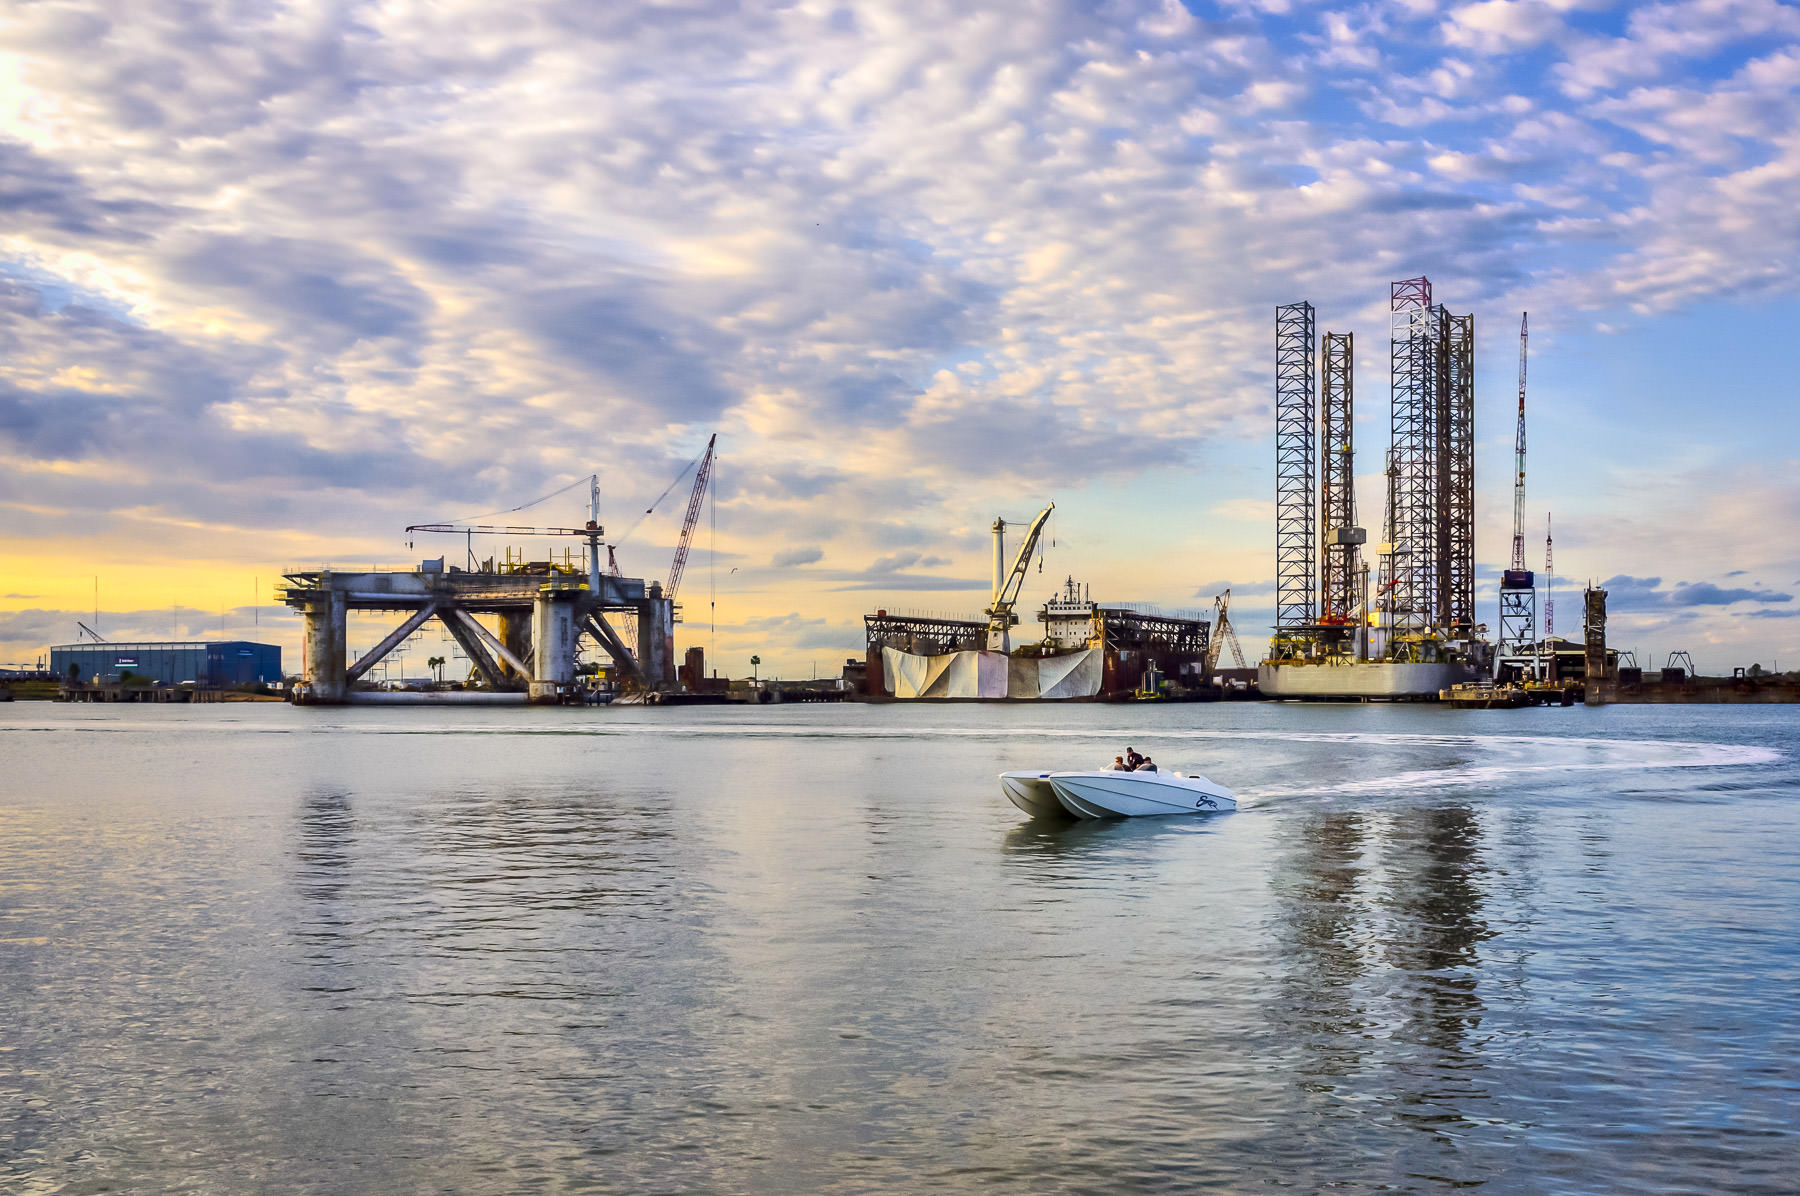 Oil platforms in drydocks at Pelican Island, Texas, as the sun sets on Galveston Harbor.